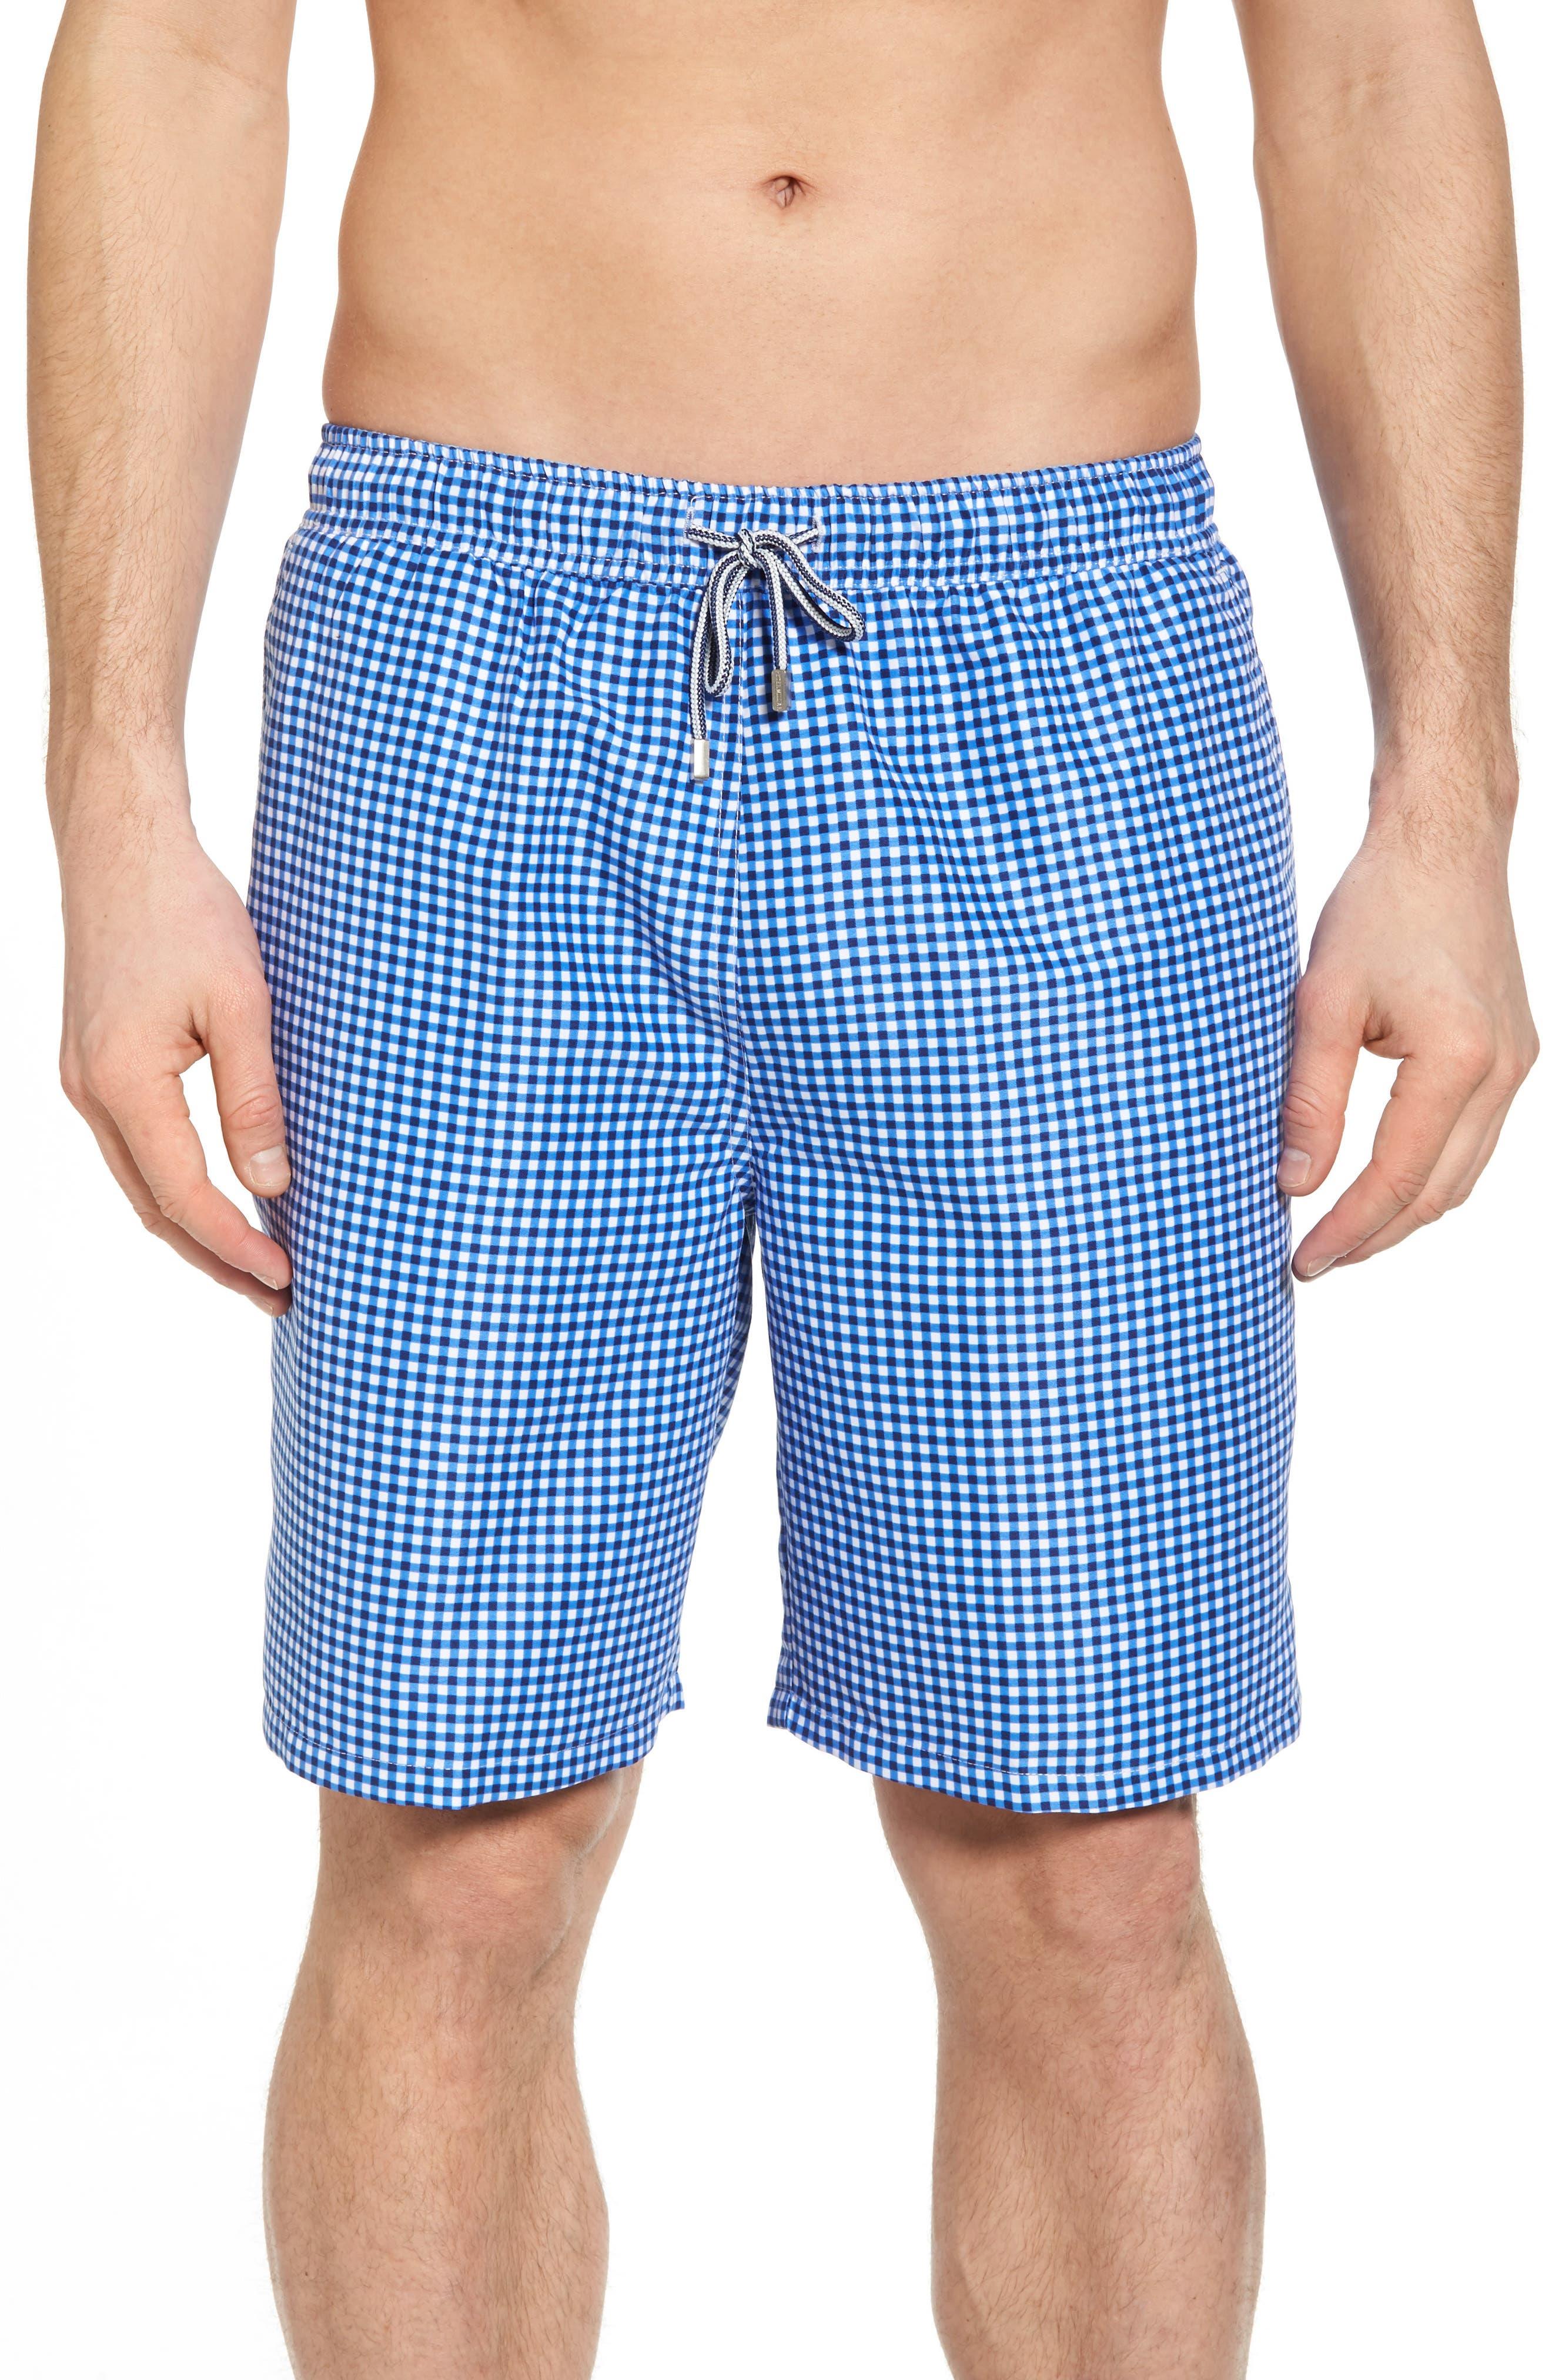 Gingham Style Swim Trunks,                         Main,                         color, ATLANTIC BLUE